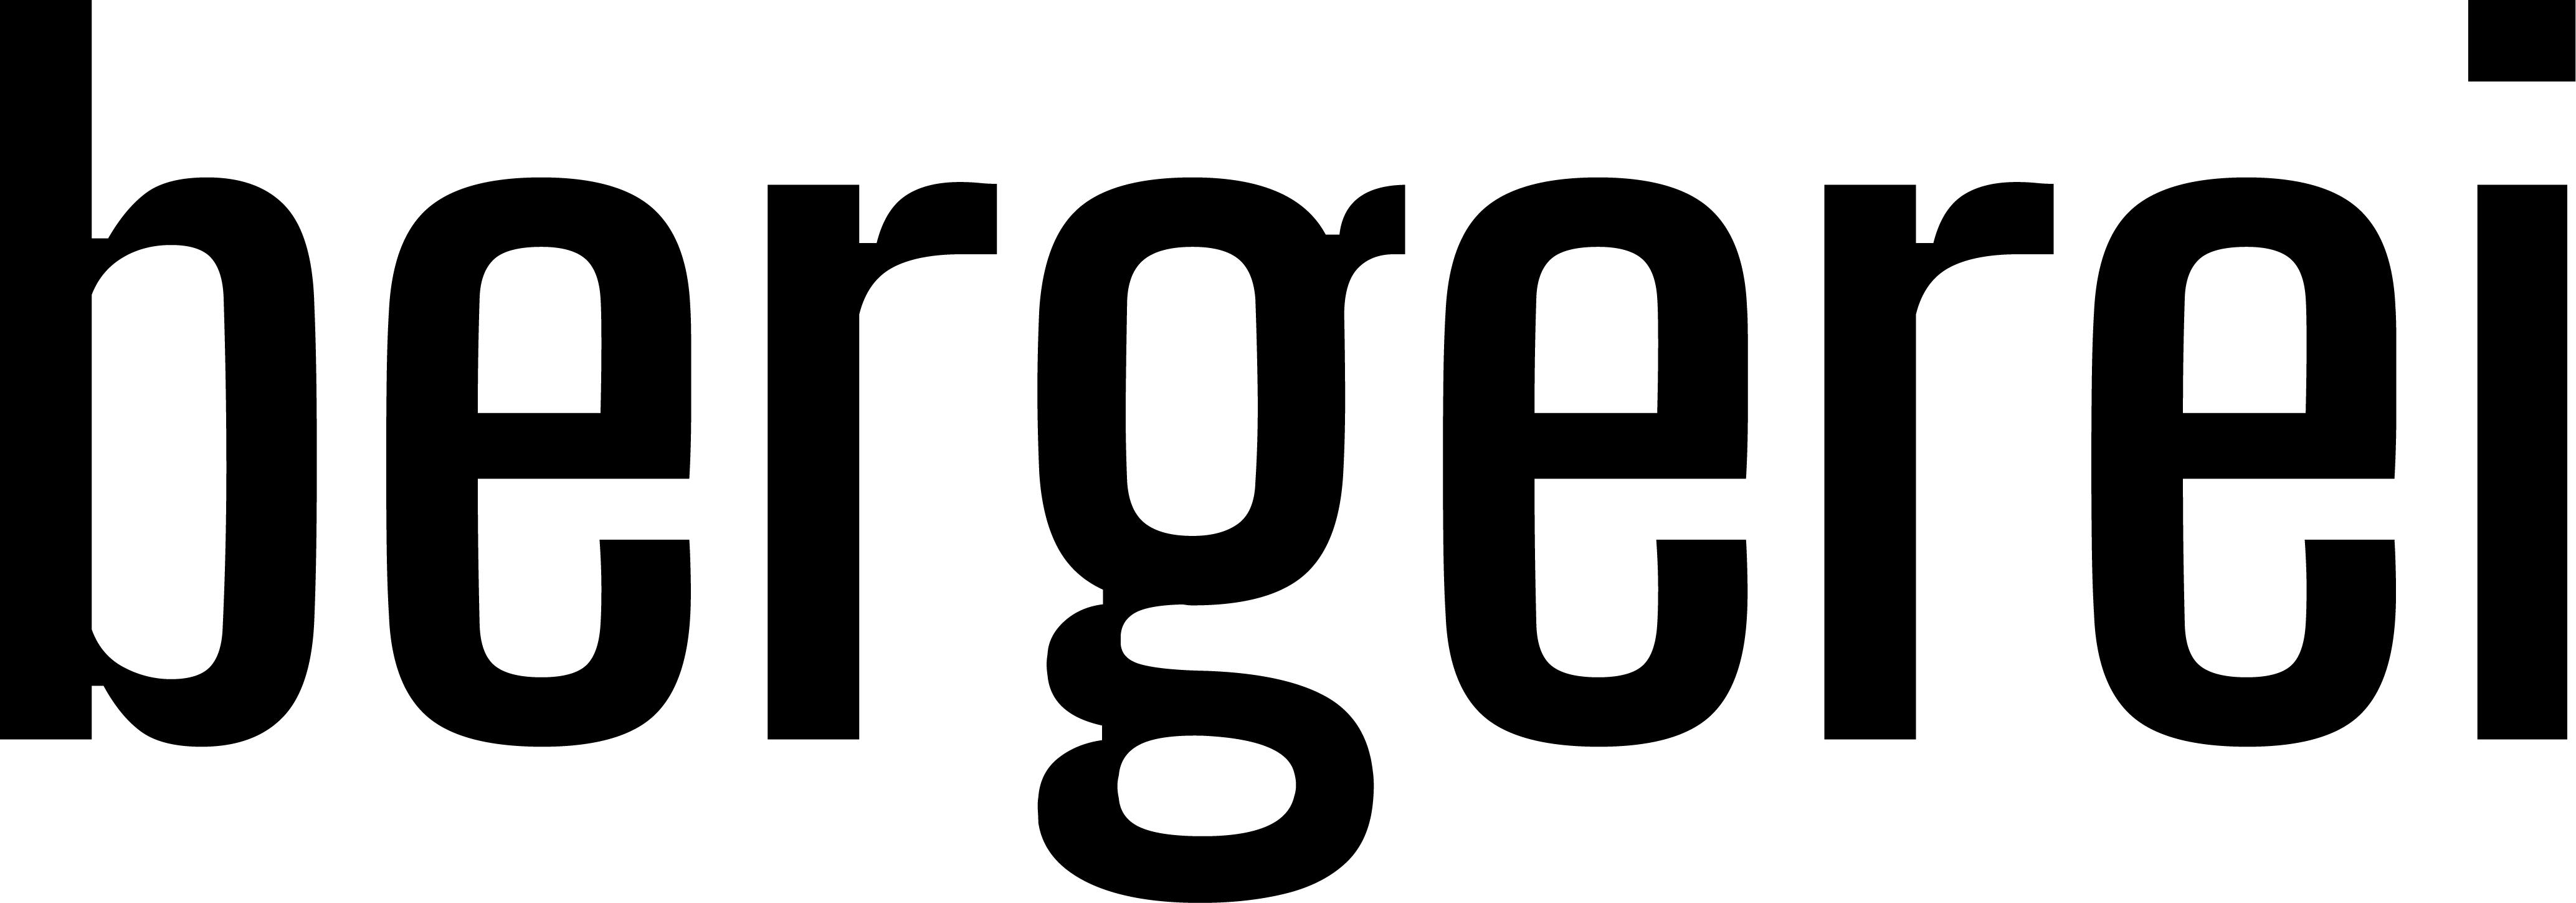 Logo Bergerei - Unverpacktladen & Tagescafé